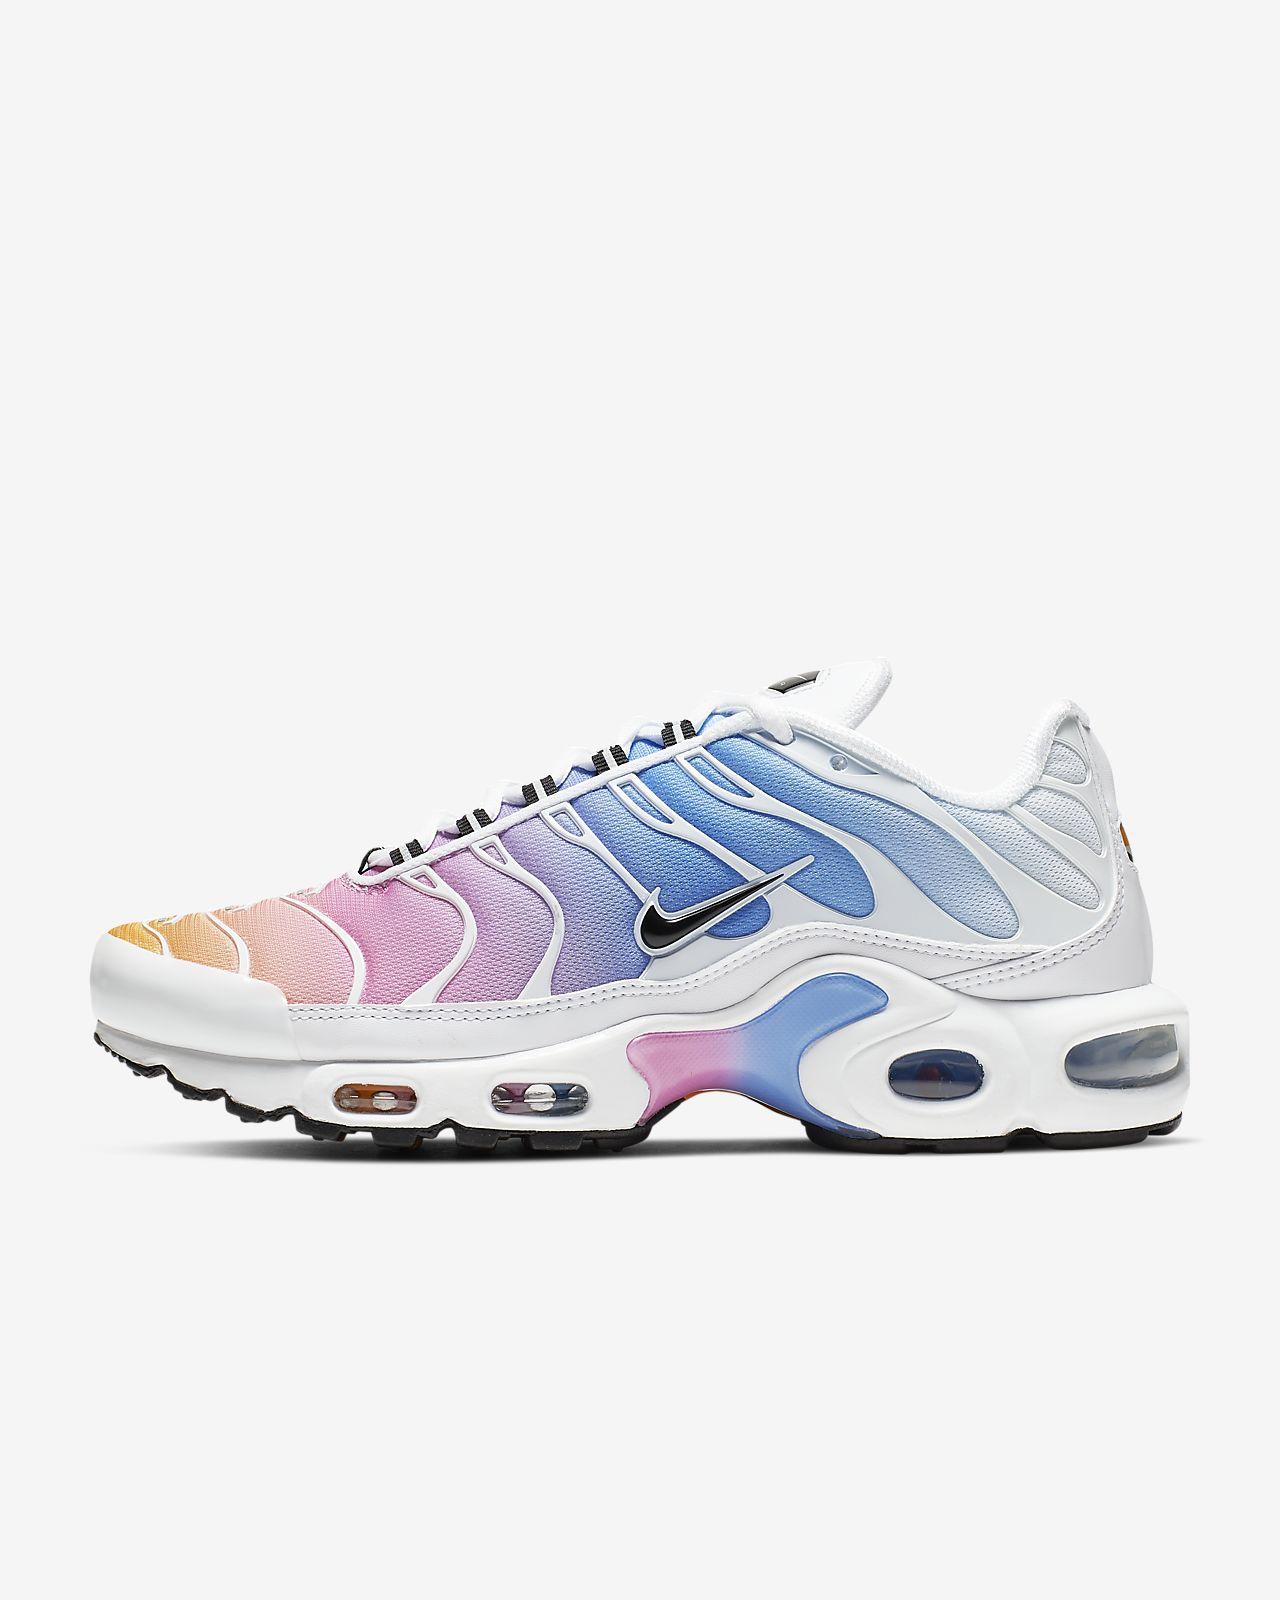 Nike Air Max Plus Metallic Women's Shoe